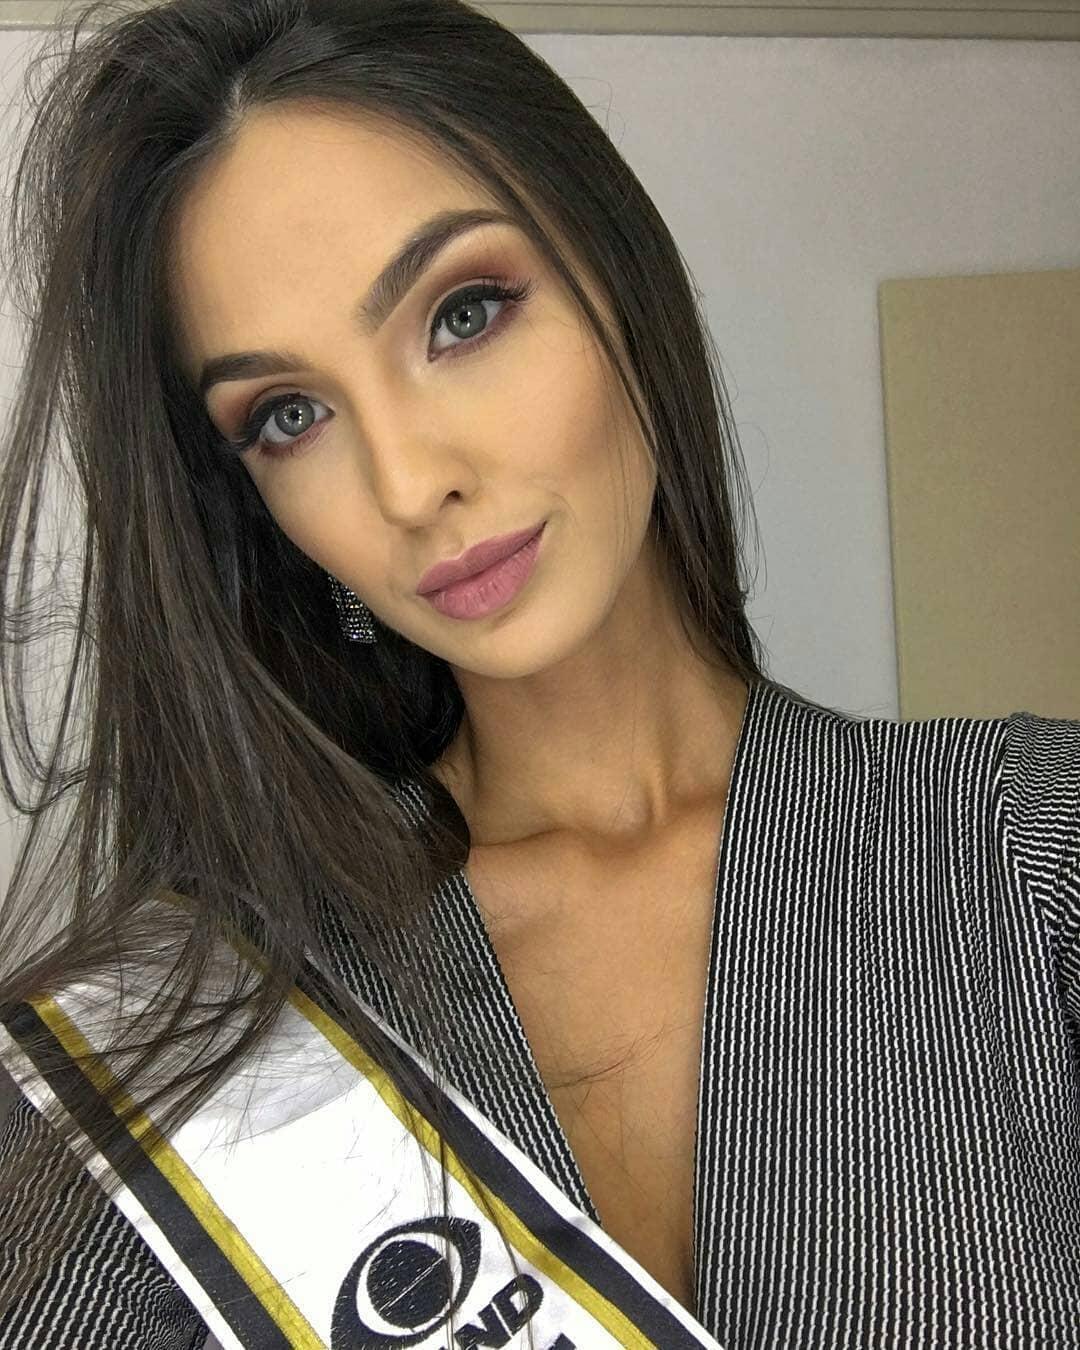 bianca scheren, top 5 de miss brasil universo 2019. 29416612